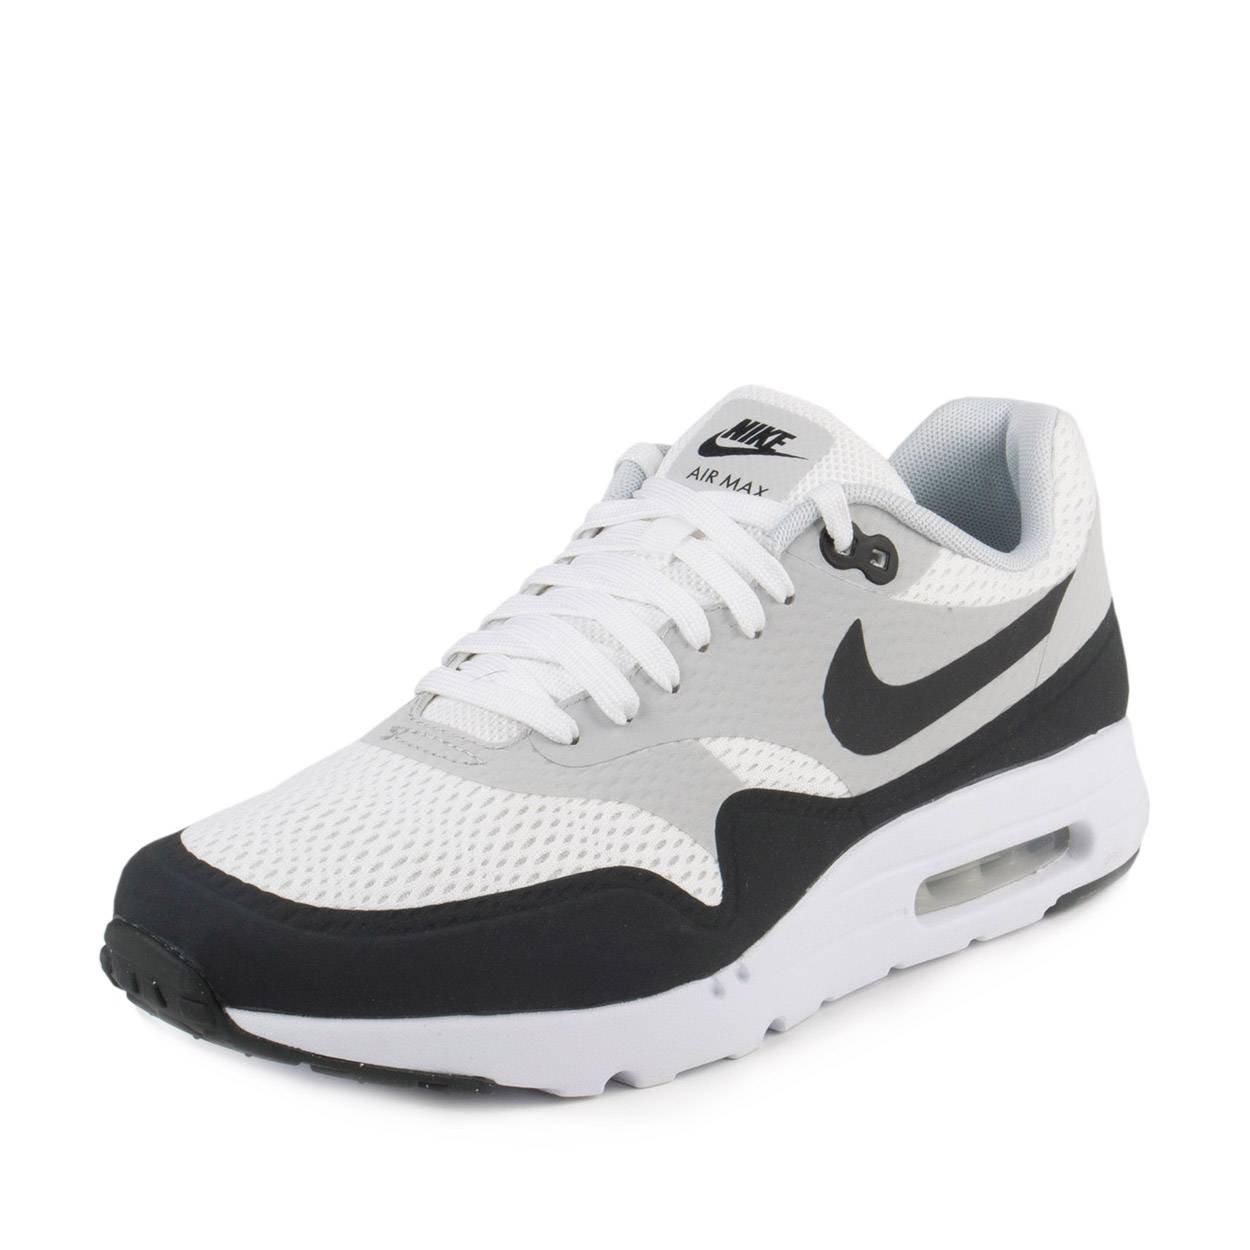 Nike Mens Air Max 1 Ultra Essential WhitePure PlatinumAnthracite 819476 100 8.5